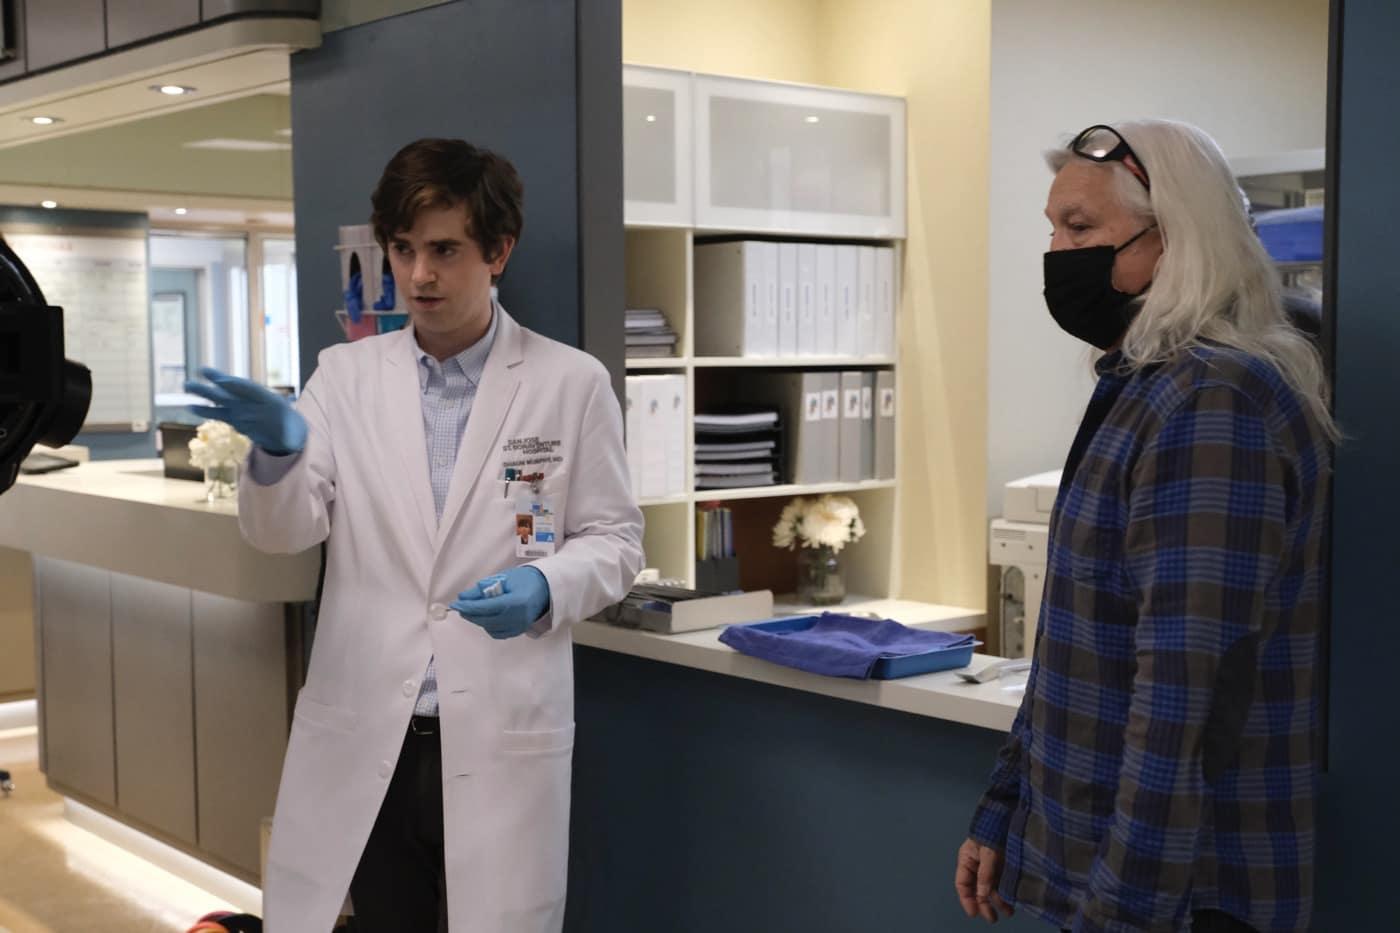 THE GOOD DOCTOR Season 4 Episode 10 Photos Decrypt FREDDIE HIGHMORE